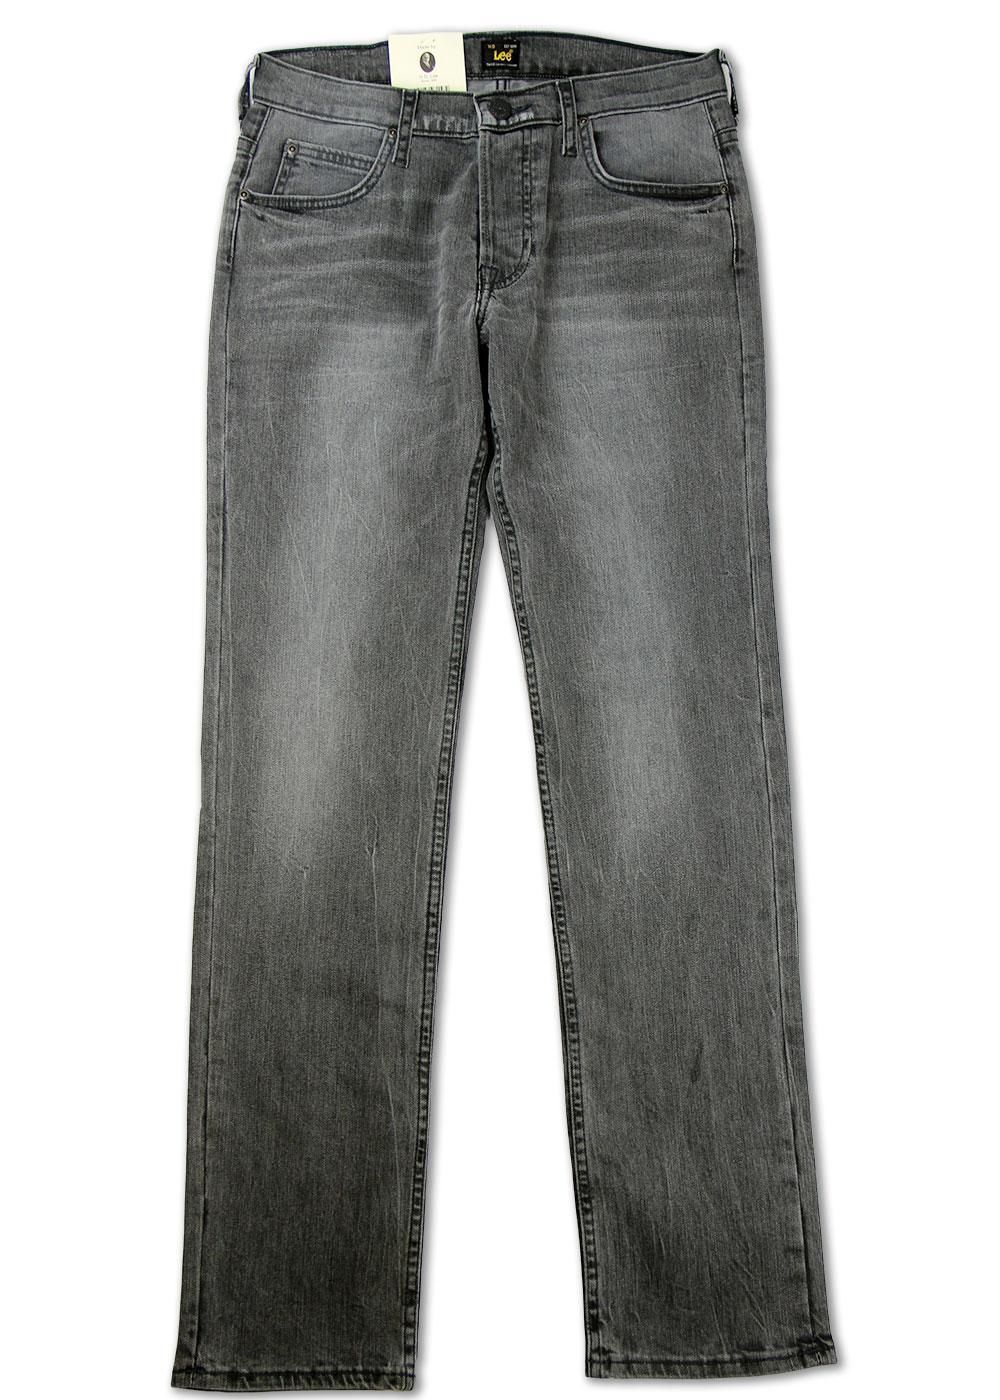 Powell LEE Jeans Retro Low Slim Denim Jeans (WG)